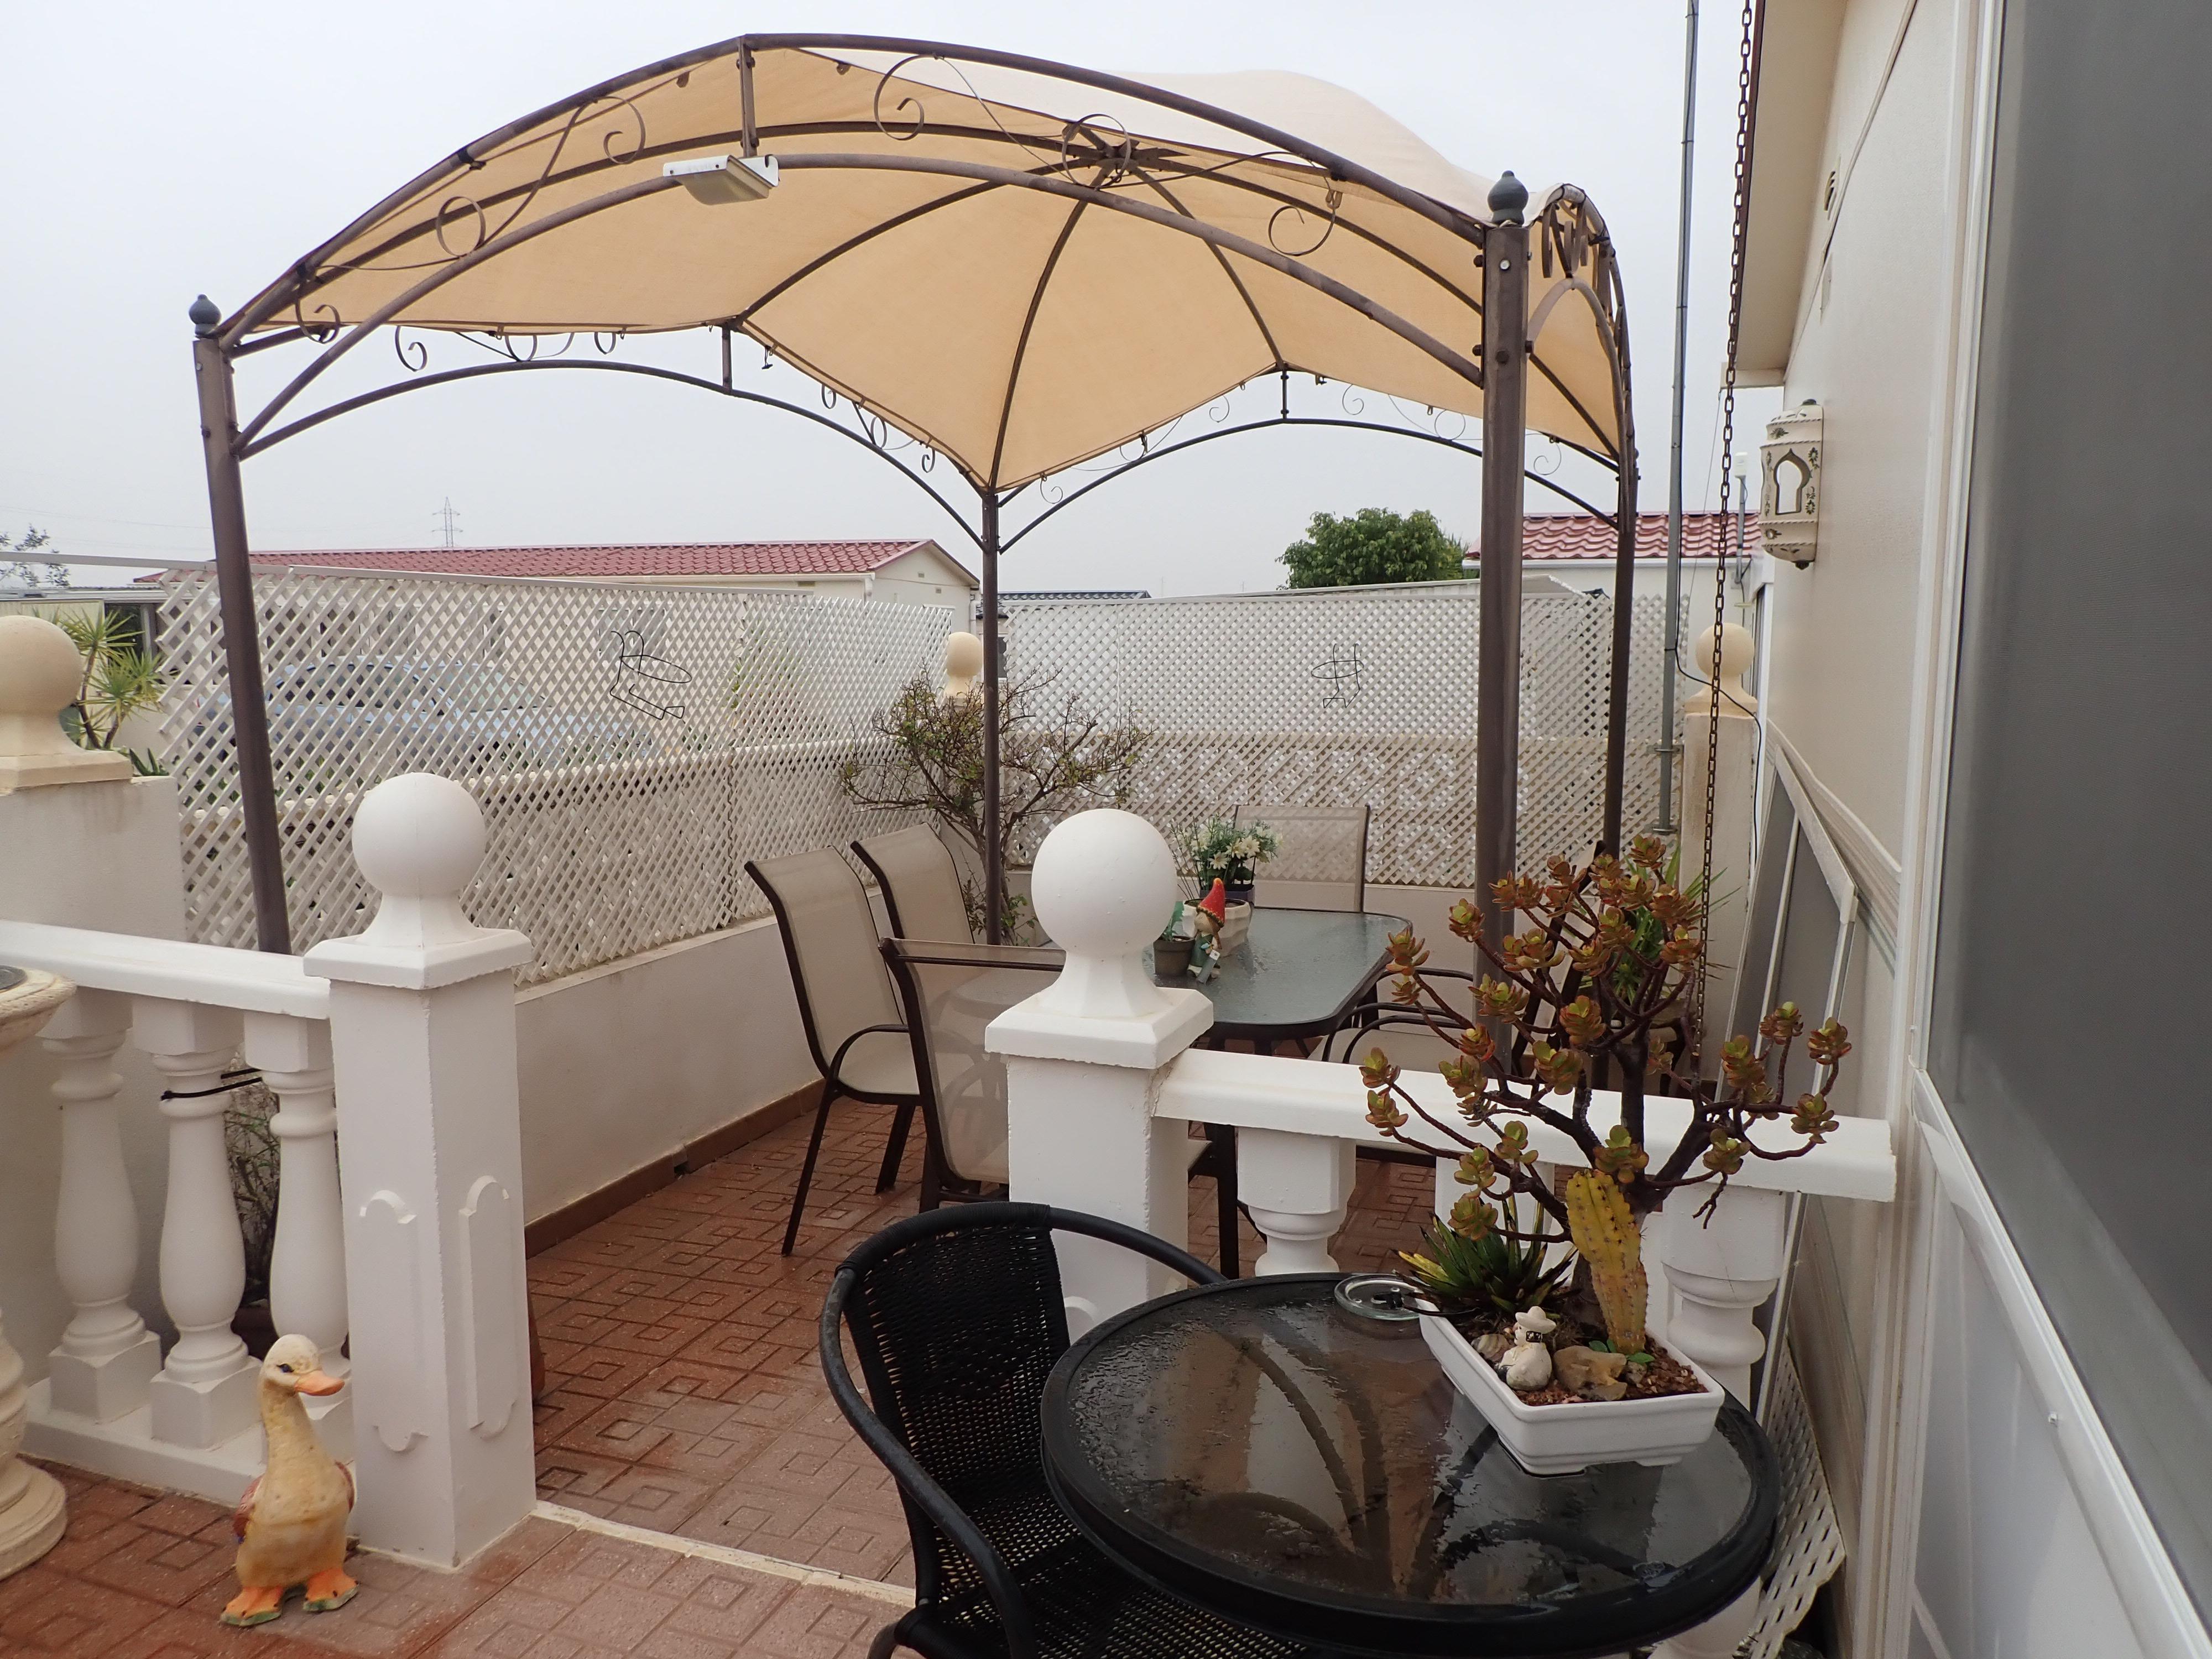 2 bed, 1 bath mobile home for sale in Los Olivos